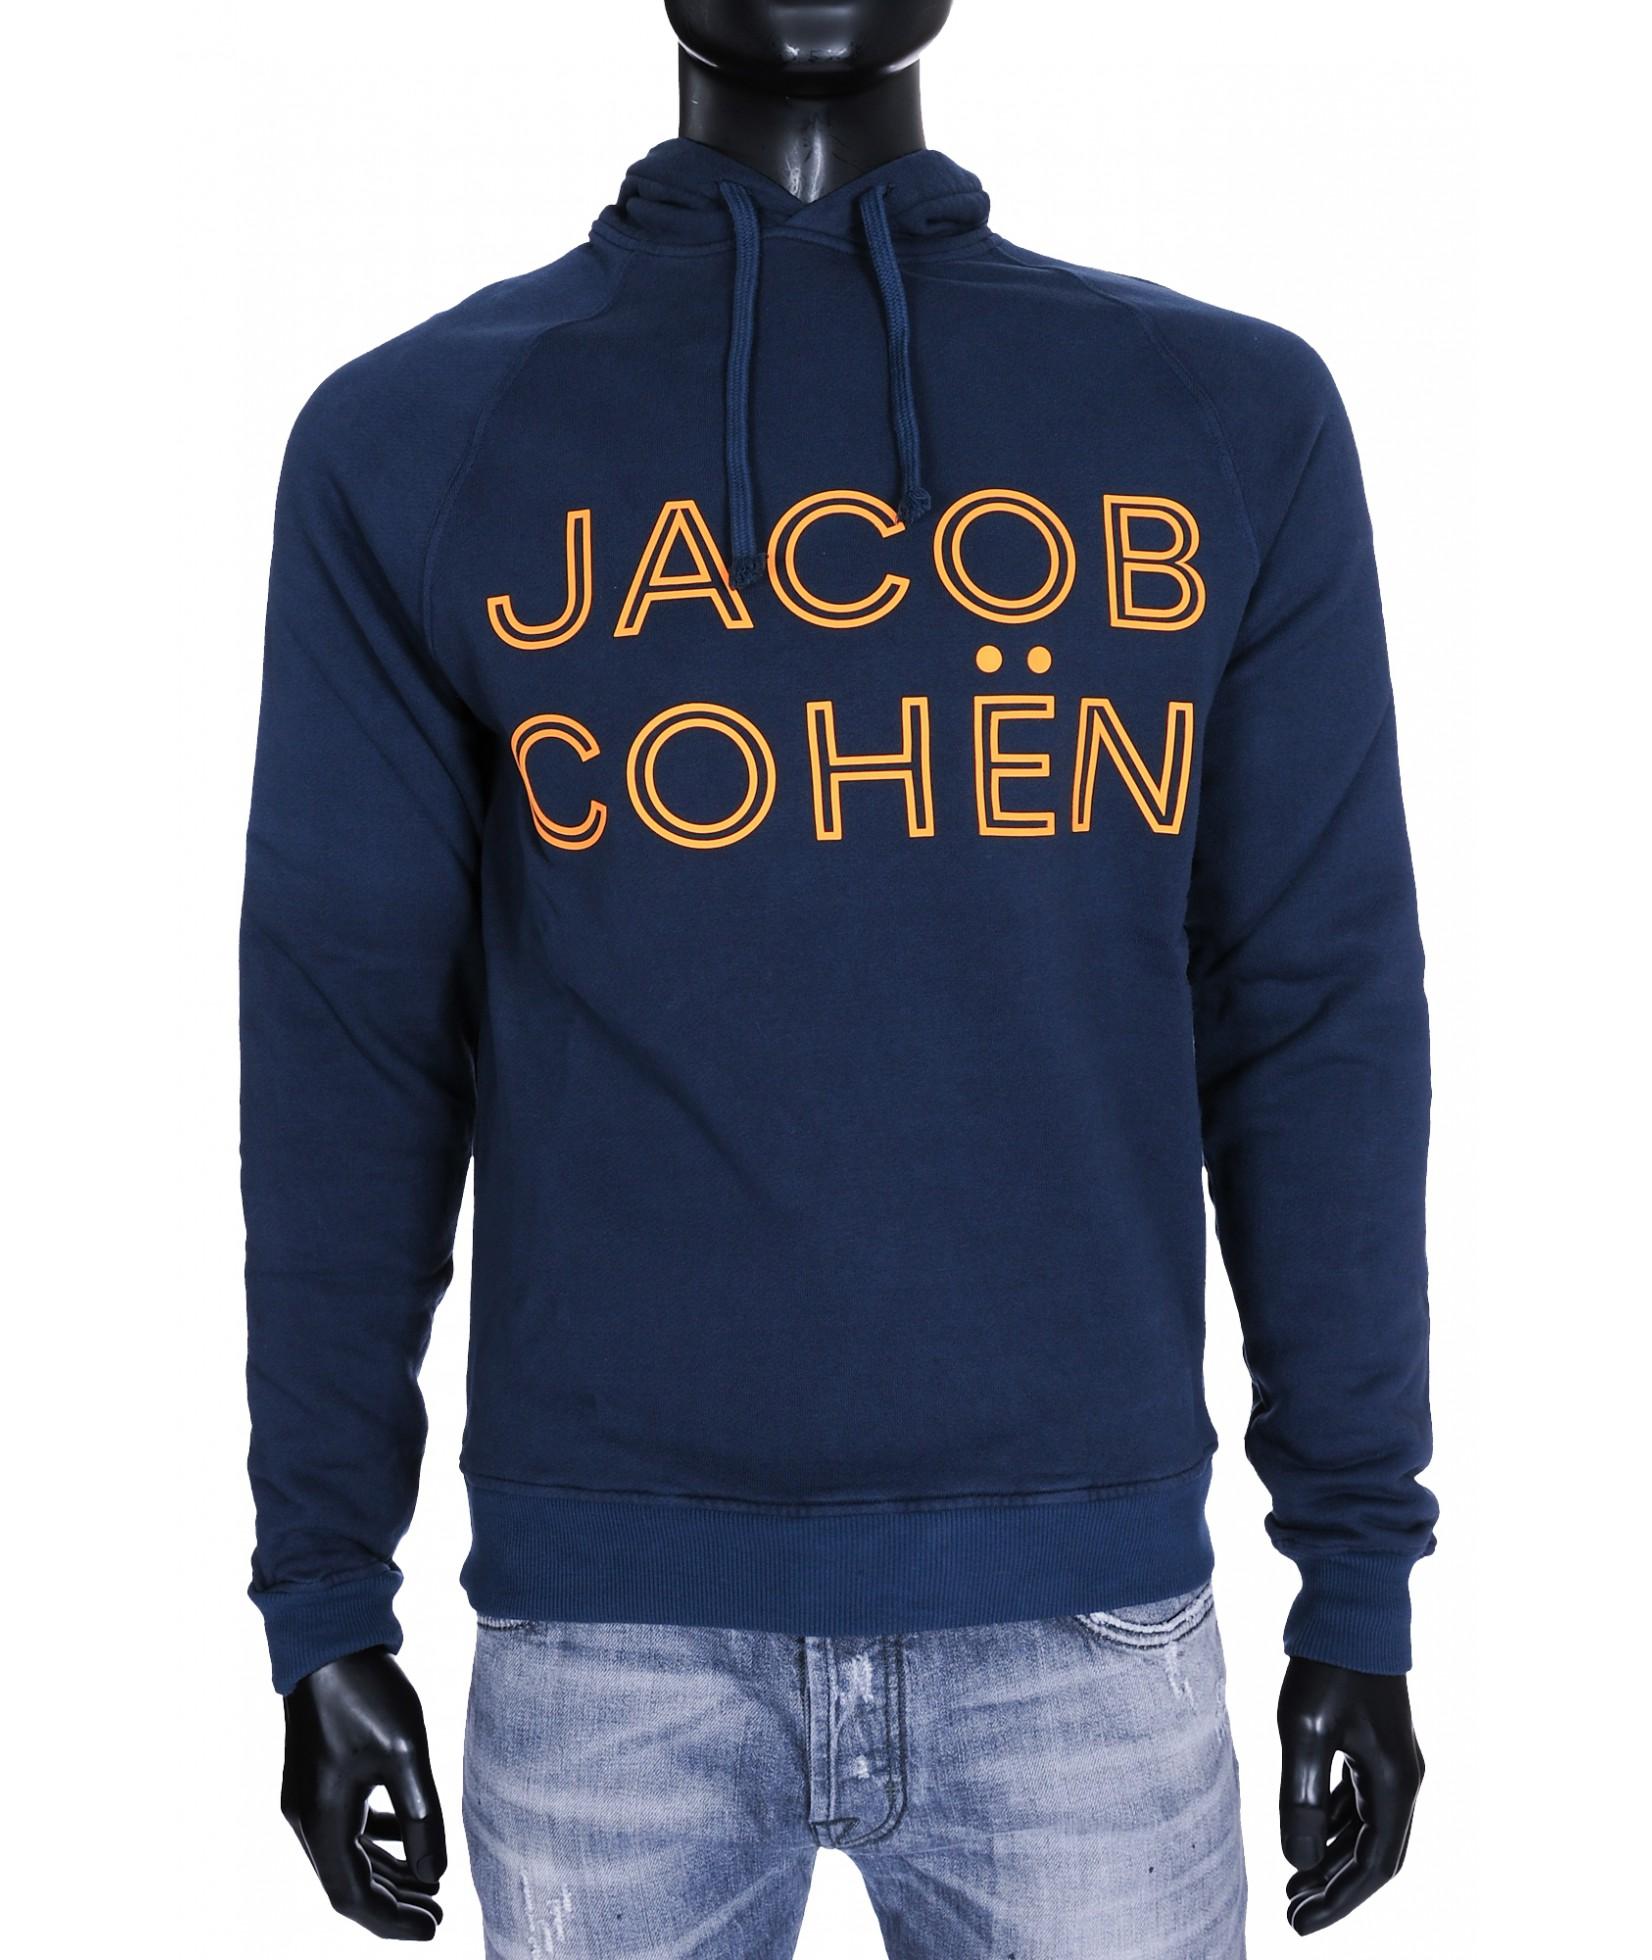 Jacob Cohen Hoodie Donkerblauw (31433)